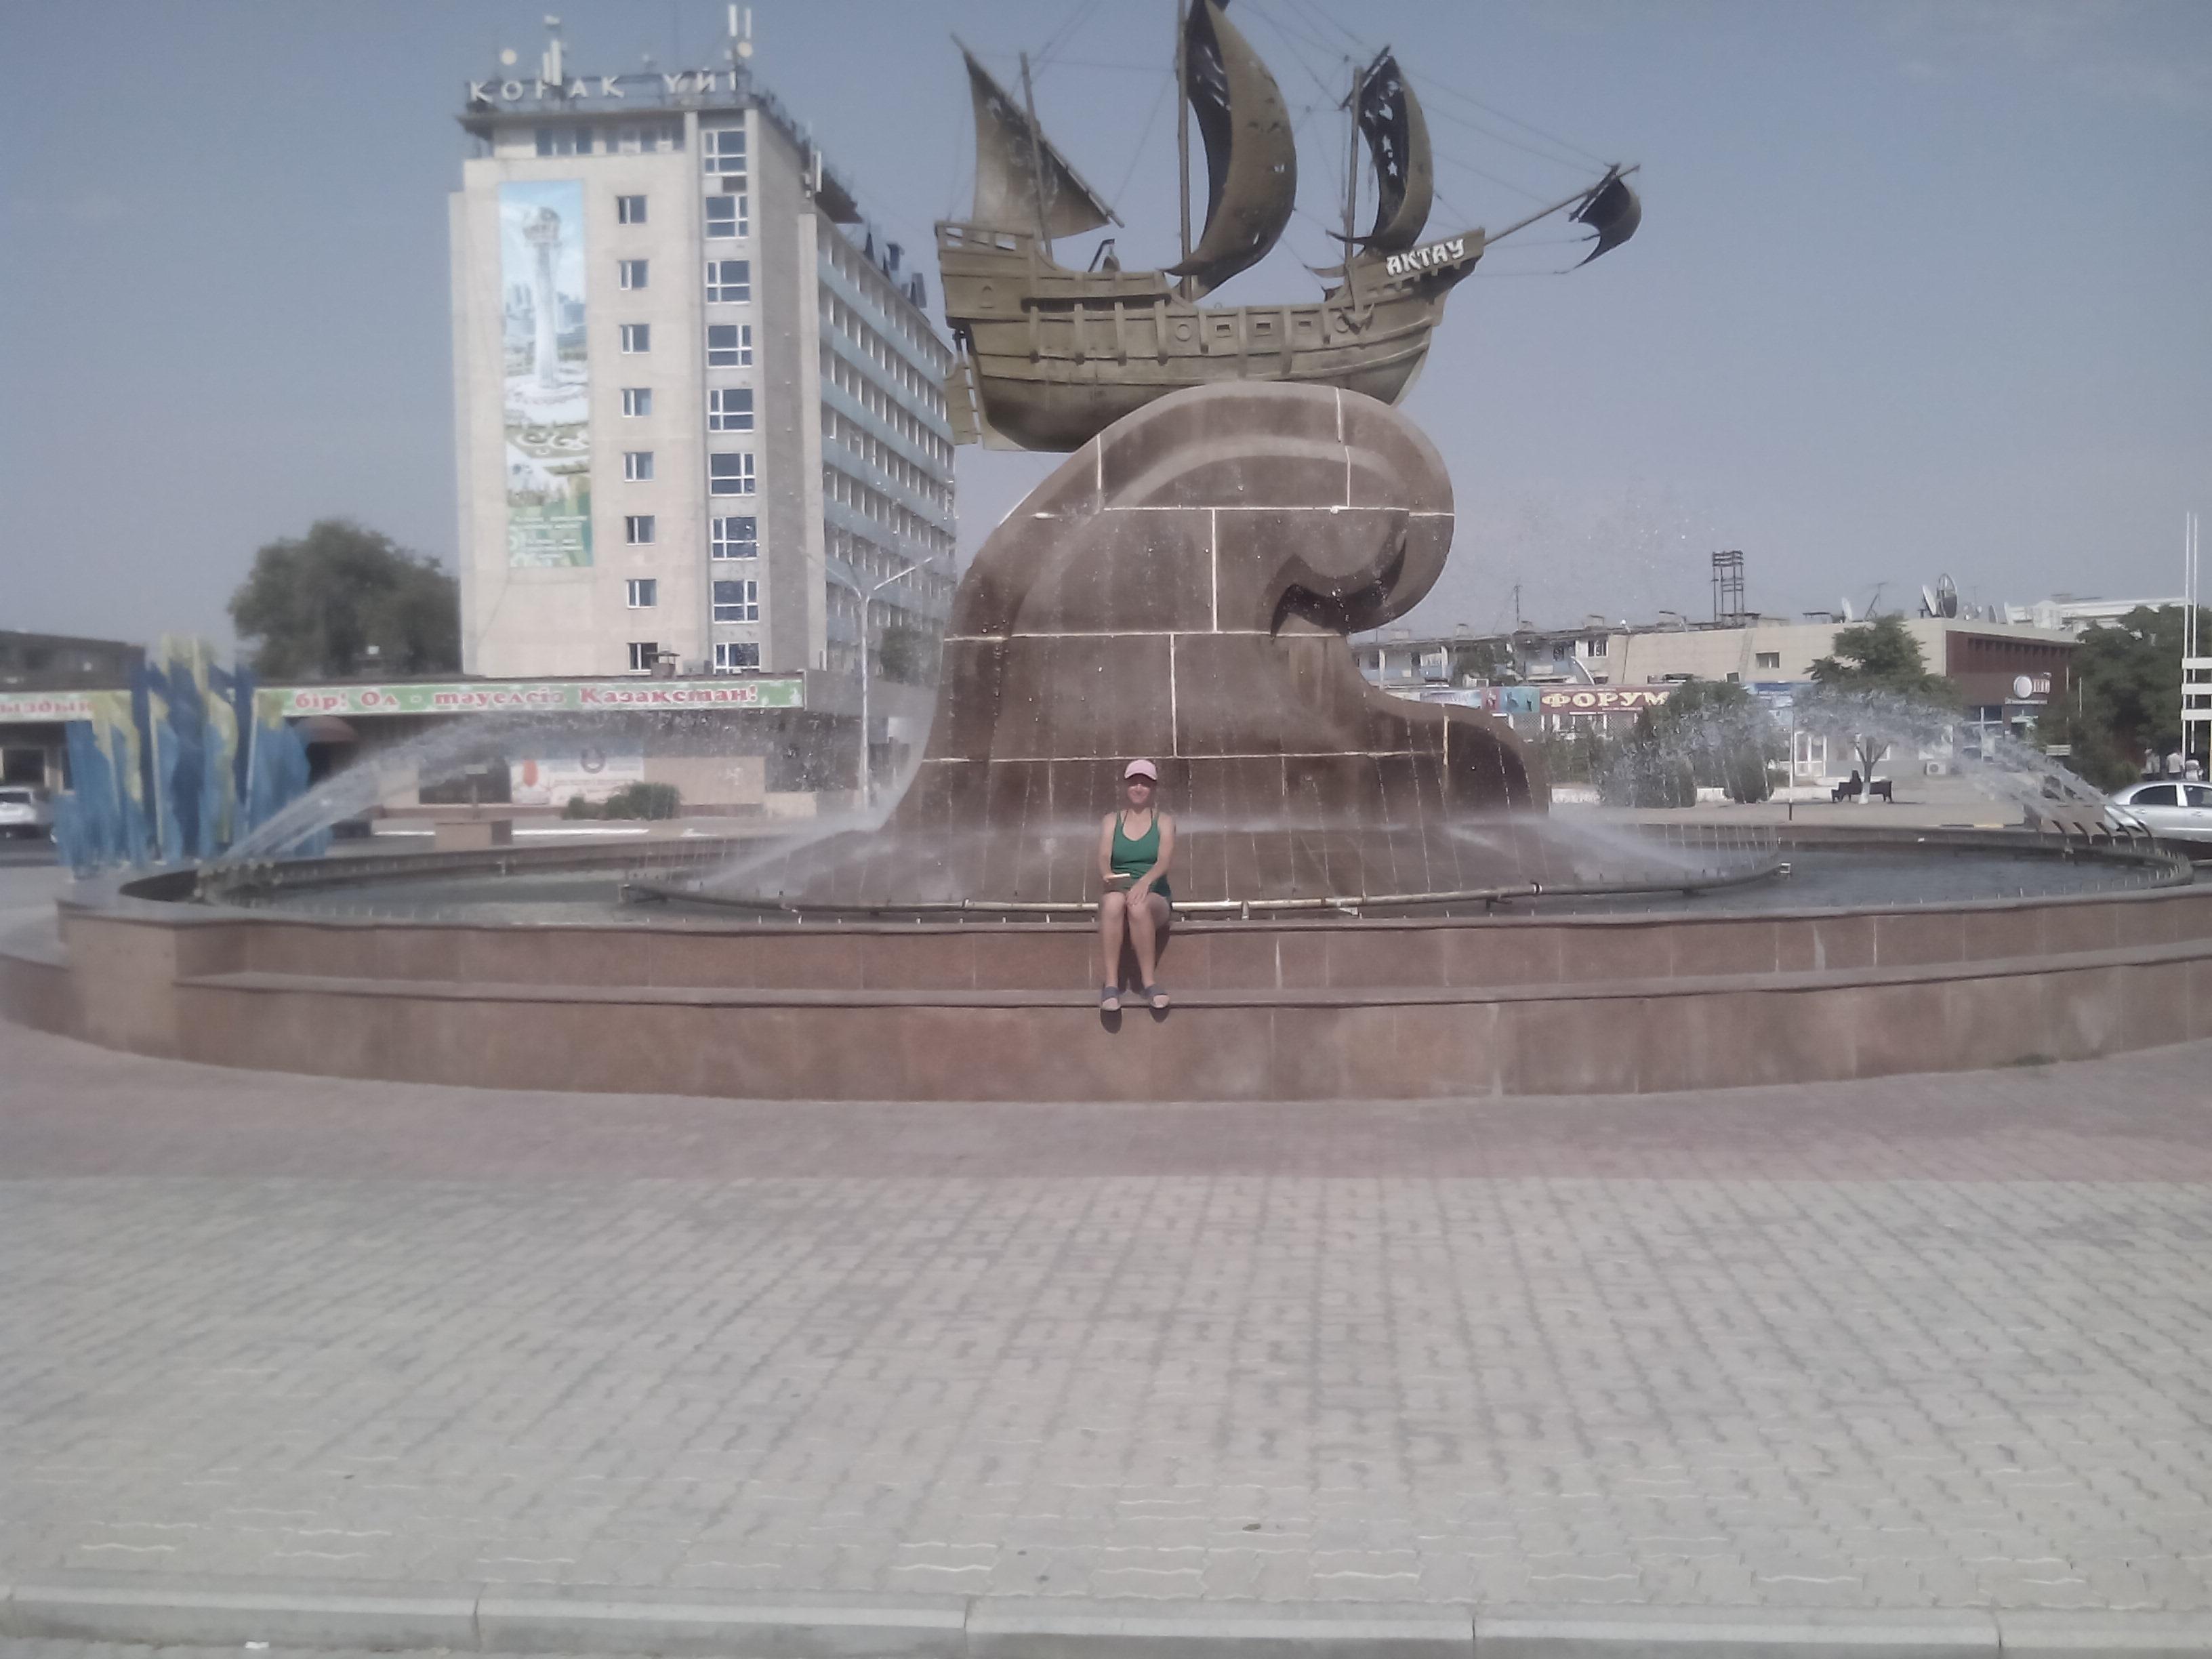 https://img-fotki.yandex.ru/get/370378/316370650.2a/0_14e035_87e1ac06_orig